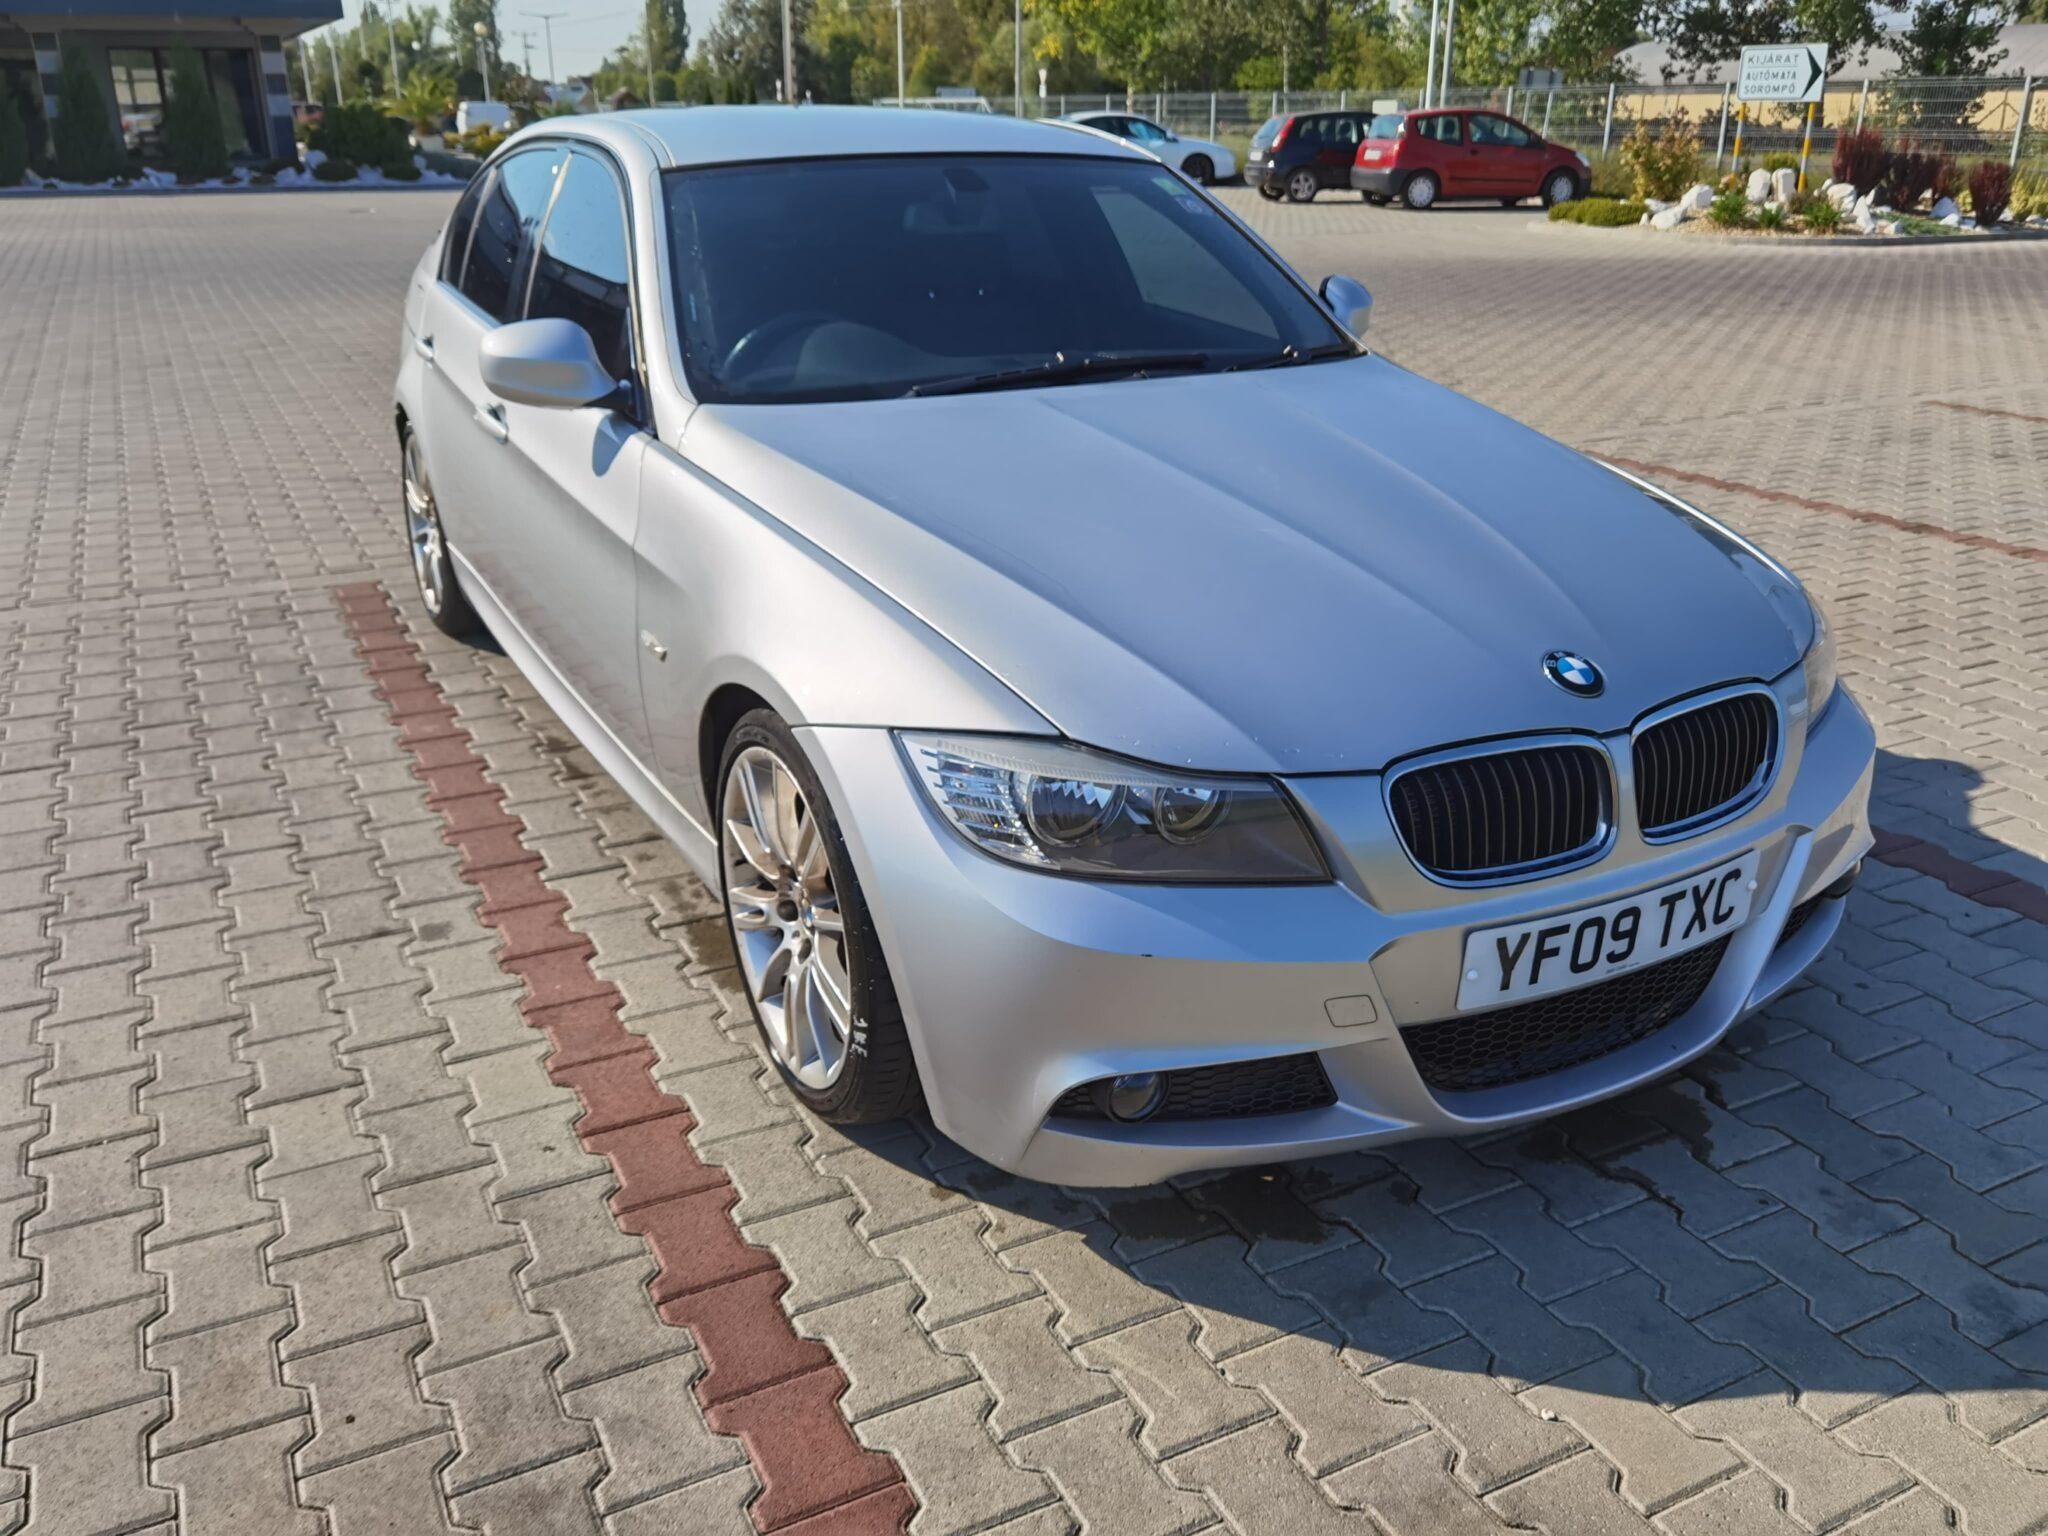 BMW E90 lci 318d Carbon Car Center Békéscsaba-2